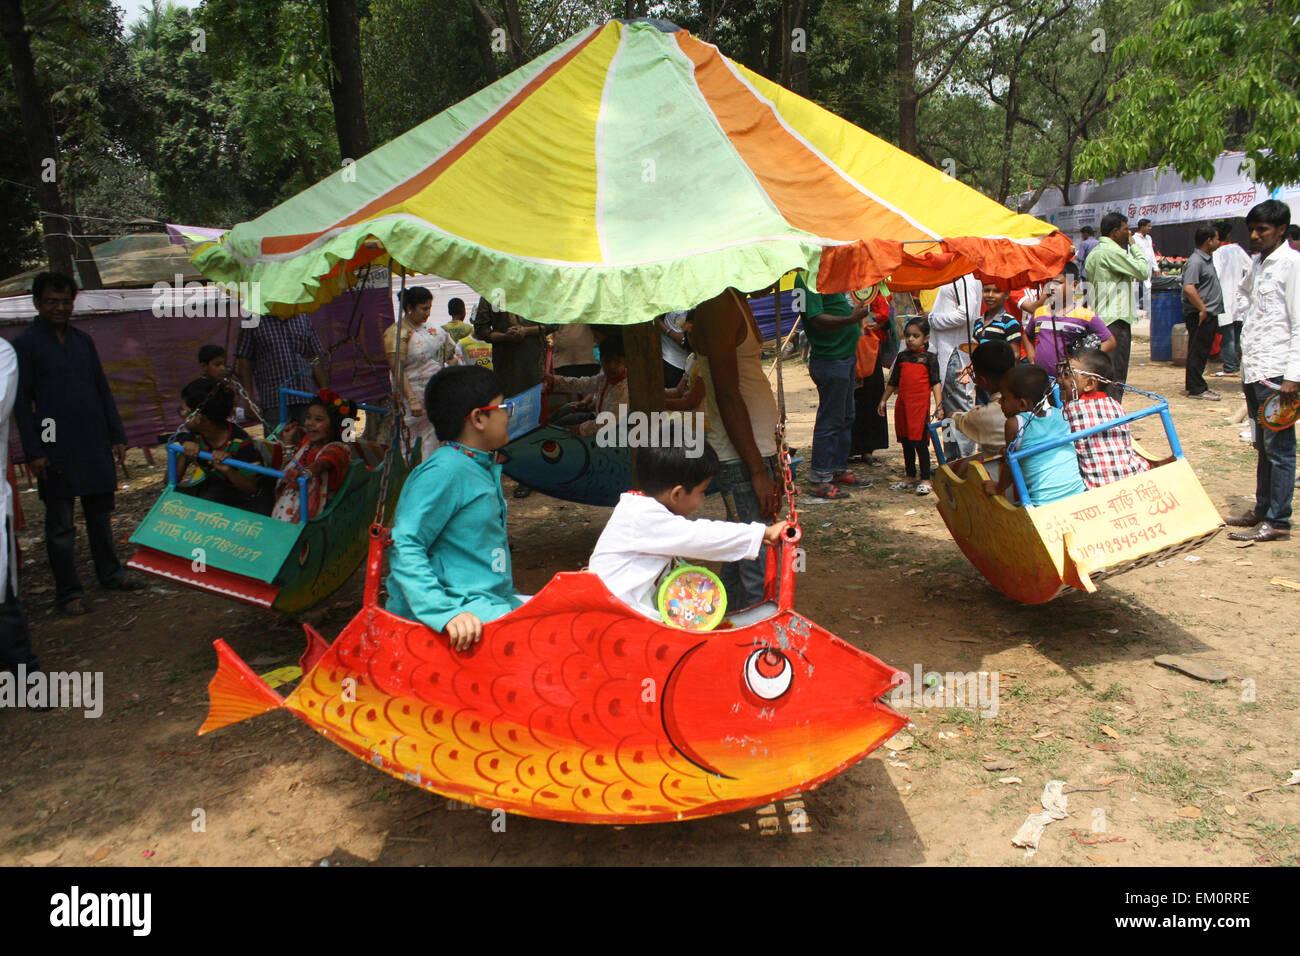 Dhaka, Bangladesh. 14th April, 2015. Bangladeshi children ride a merry-go-round as they celebrate the Bengali New - Stock Image